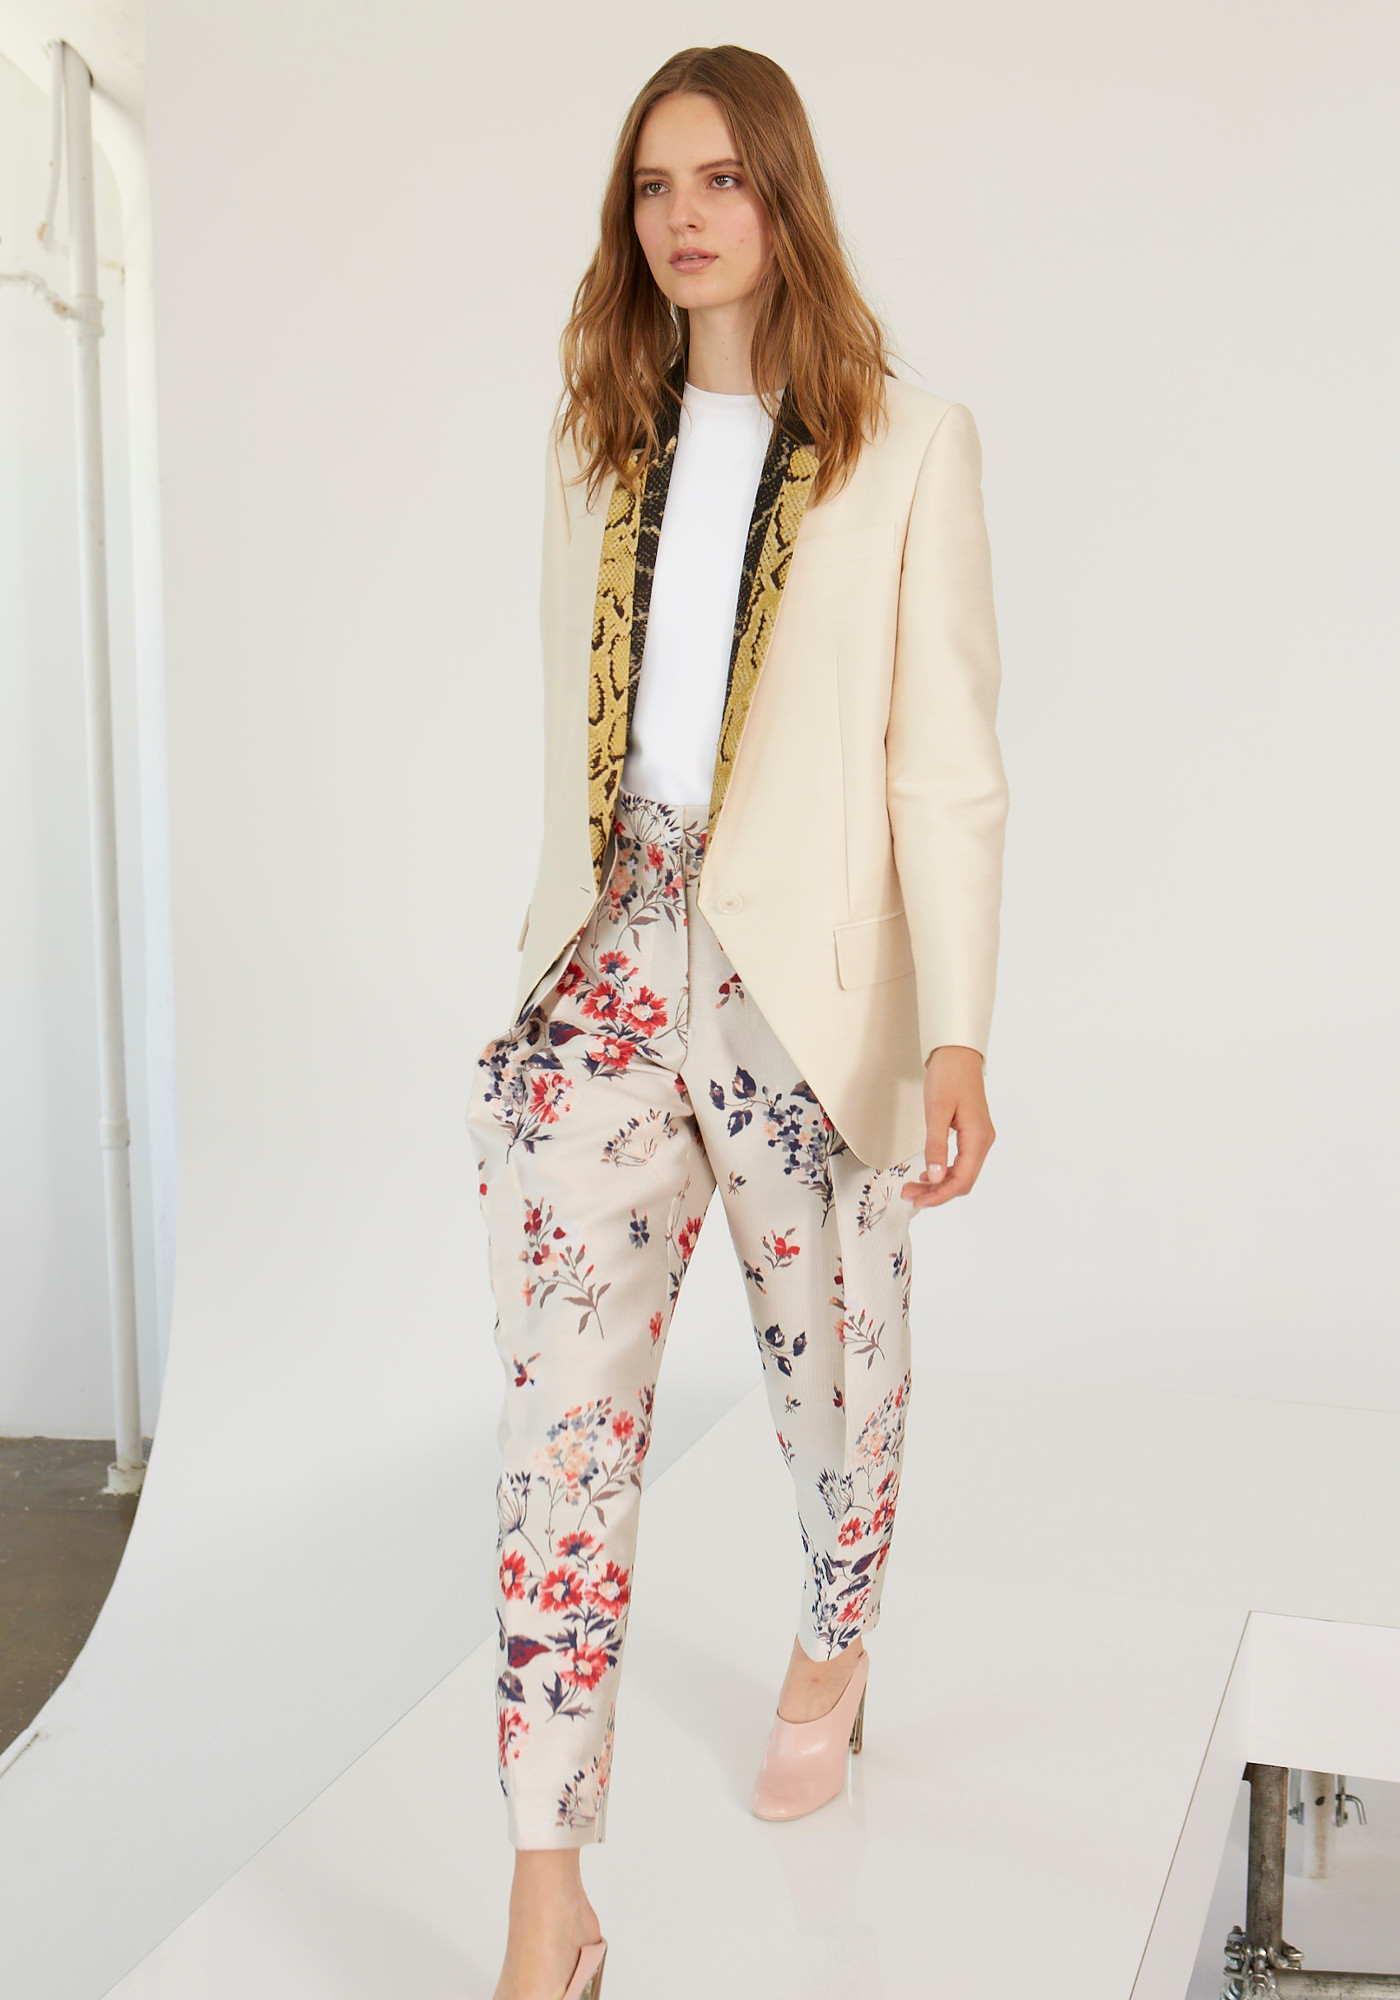 Trend Spotlight: Pajama Inspired